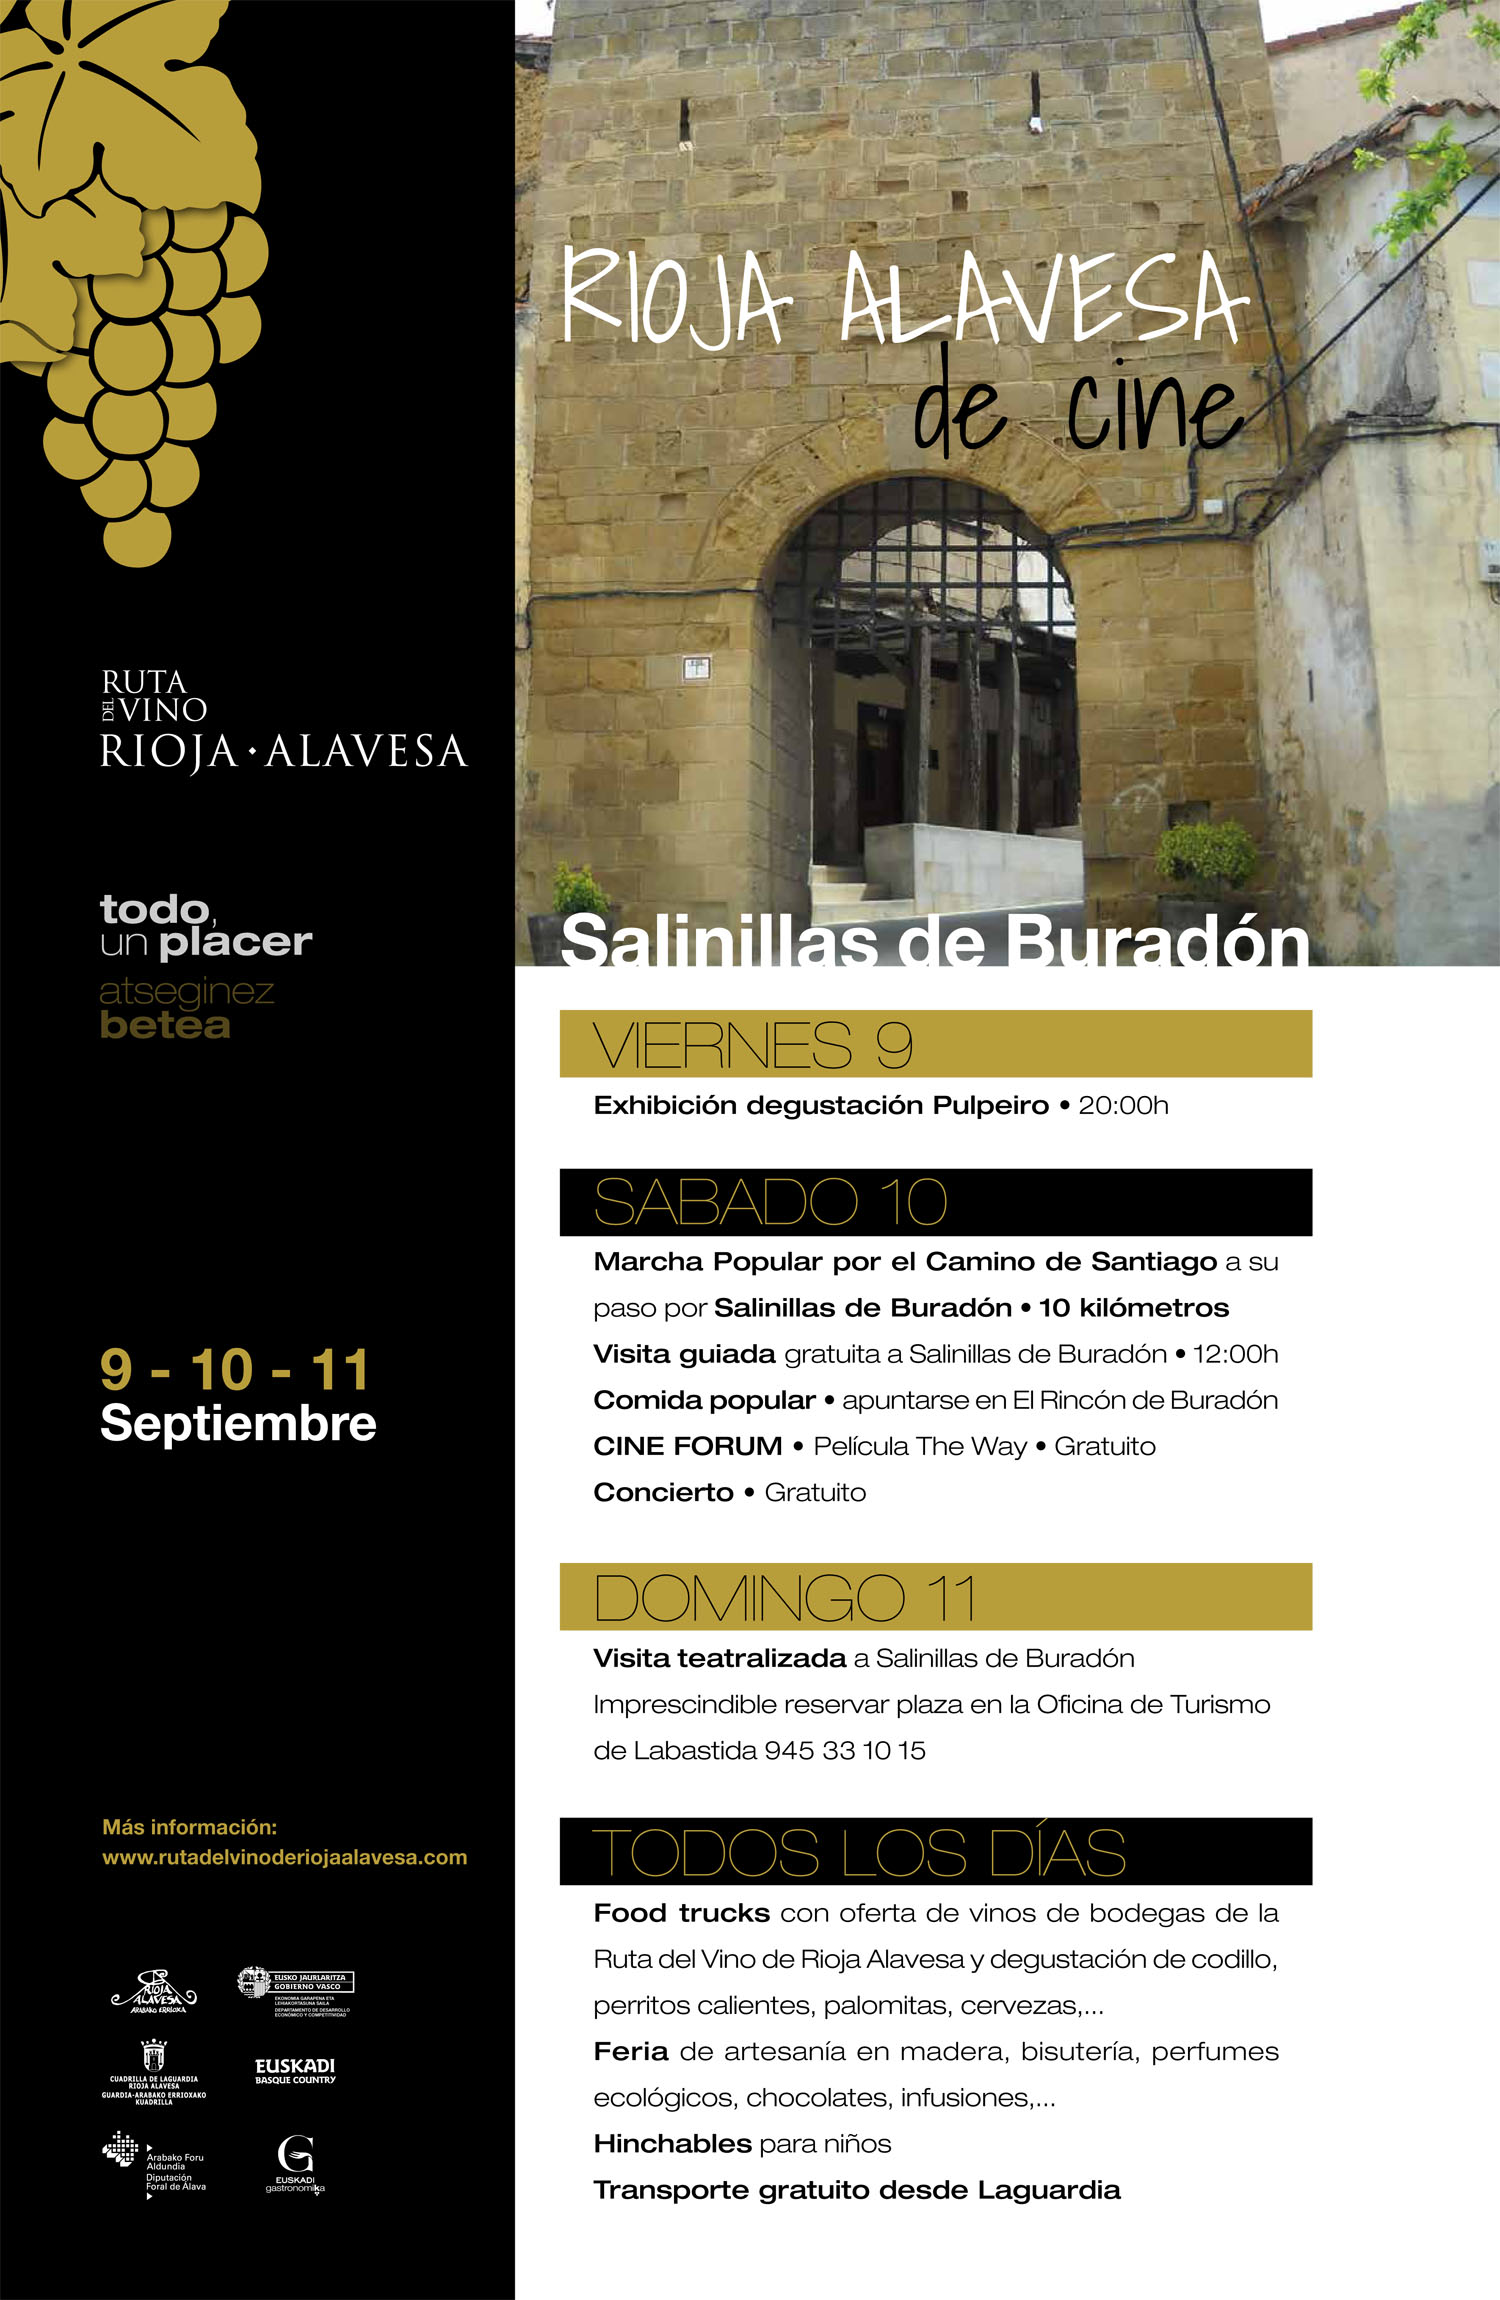 Foto1NP_RiojaAlavesa_RiojaAlavesadeCine_30082016